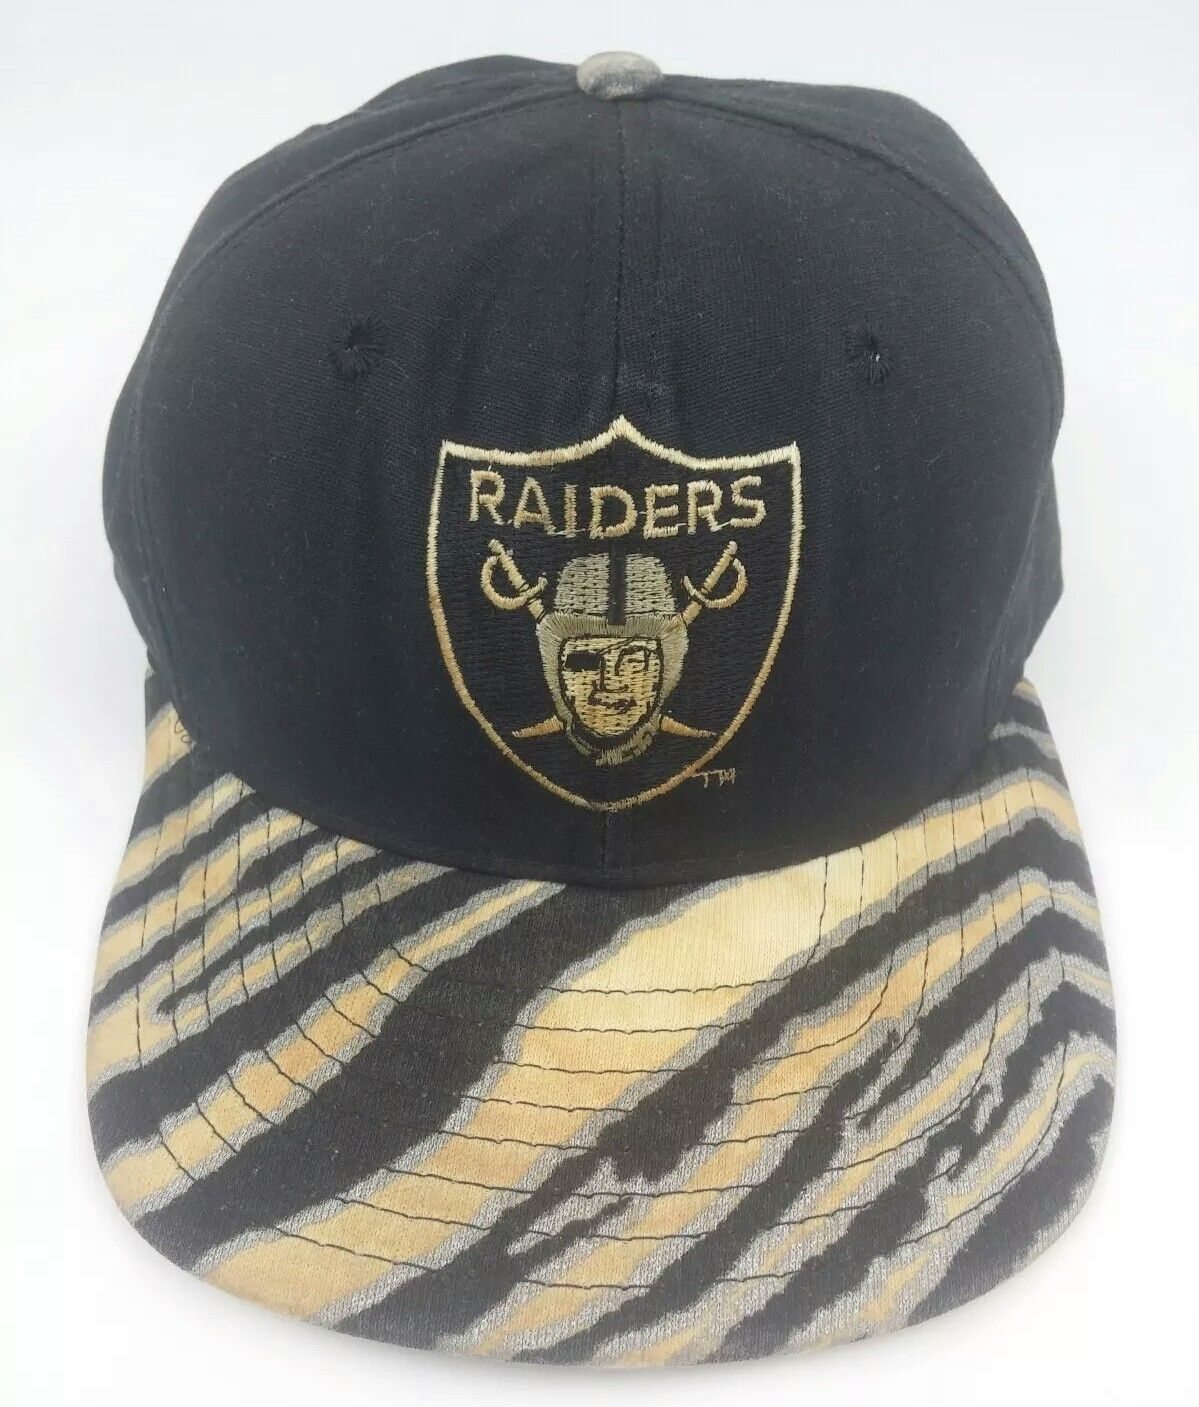 5781d8b9453 Raiders Zubaz Brim Snapback Hat Authentic and 50 similar items. S l1600